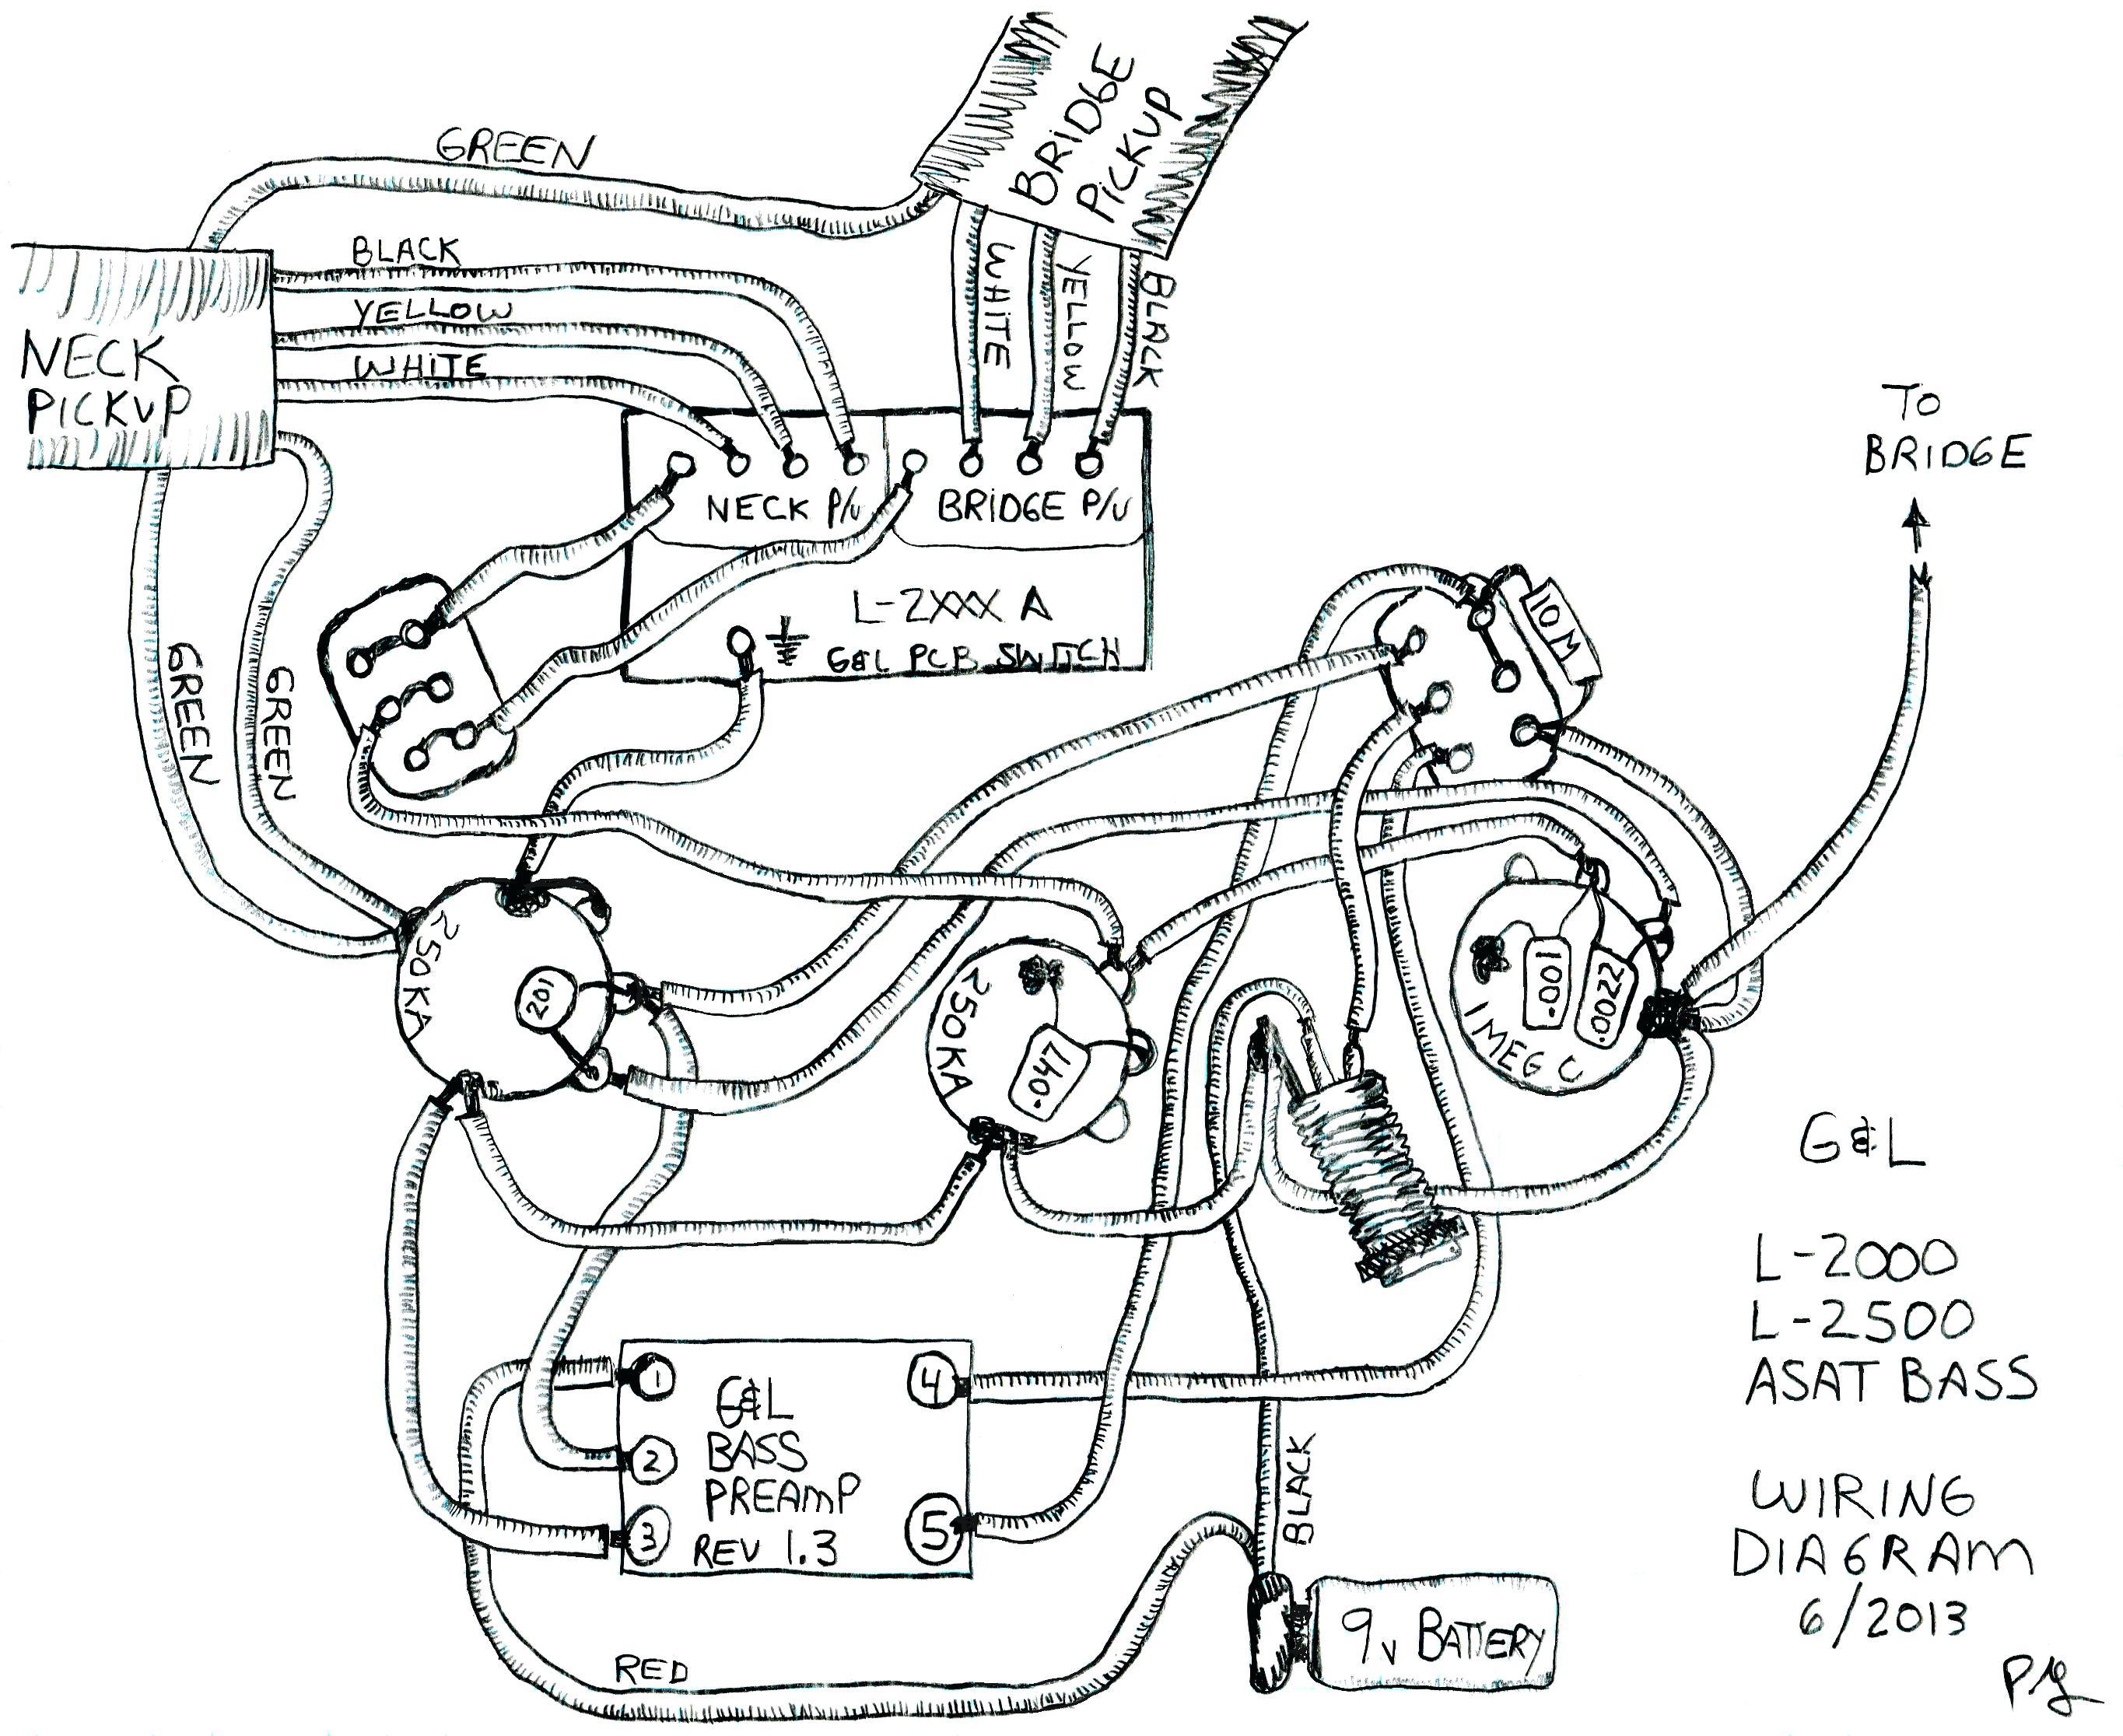 gibson les paul 3 pickup wiring diagram 1988 volvo 240 radio drawing at getdrawings free for